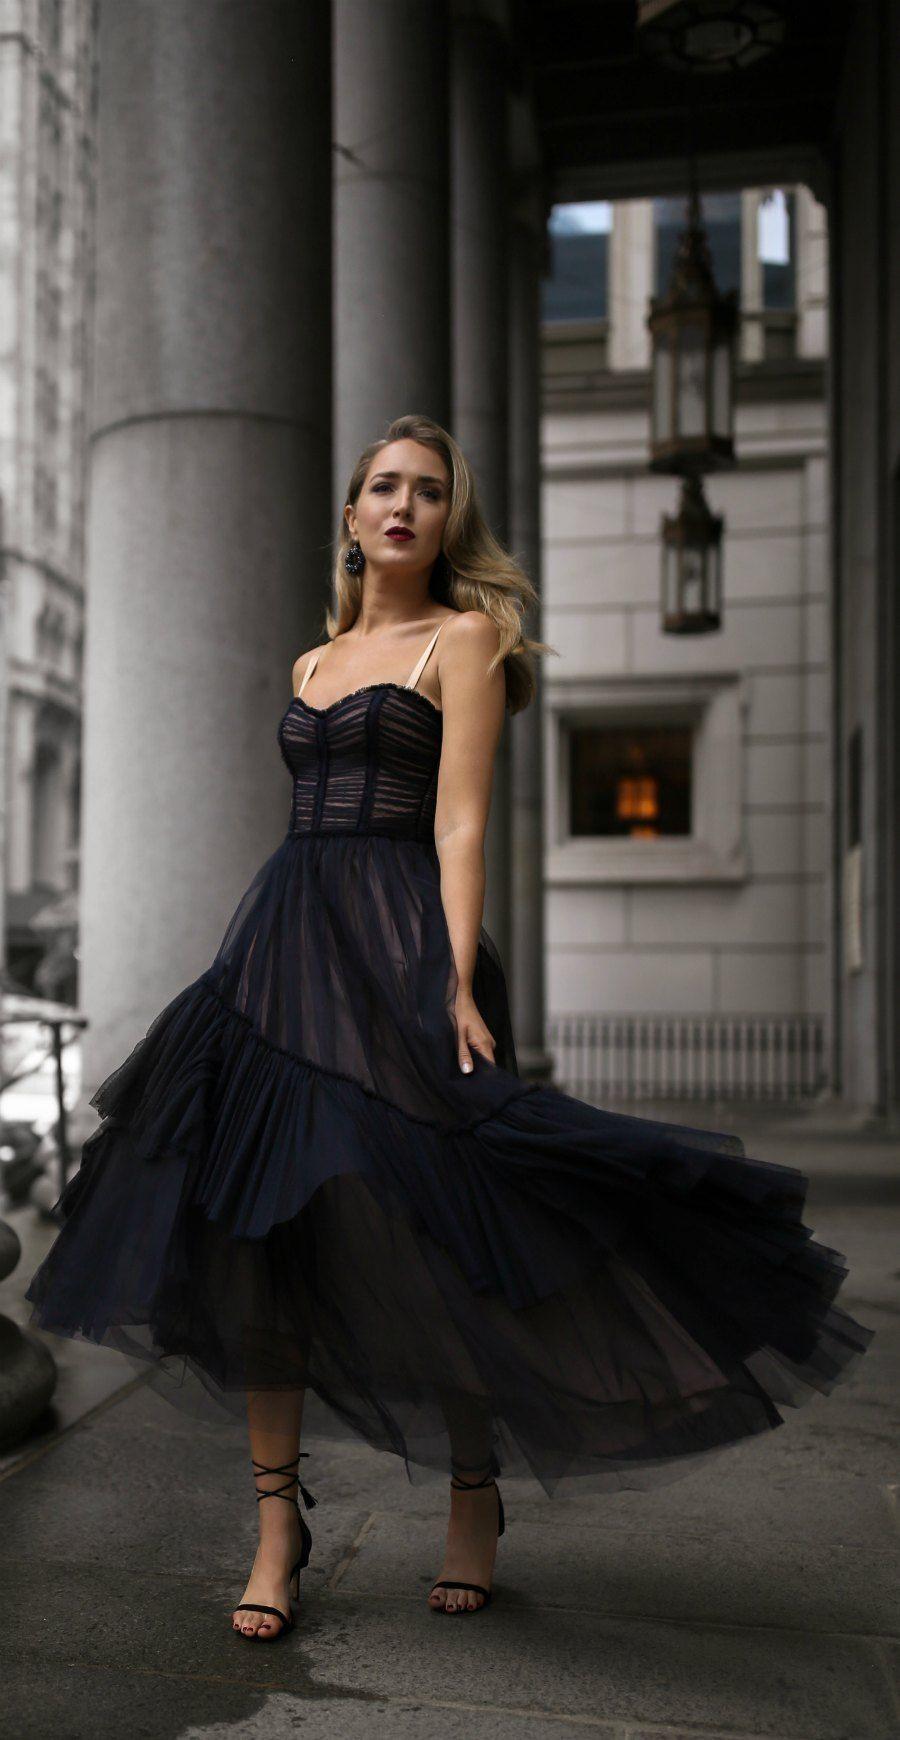 30 Dresses In 30 Days Day 19 Charity Gala Black Lace Tulle Bodice Style Flowy Midi Dress B Flowy Dress Formal Necklines For Dresses Black Dresses Classy [ 1740 x 900 Pixel ]